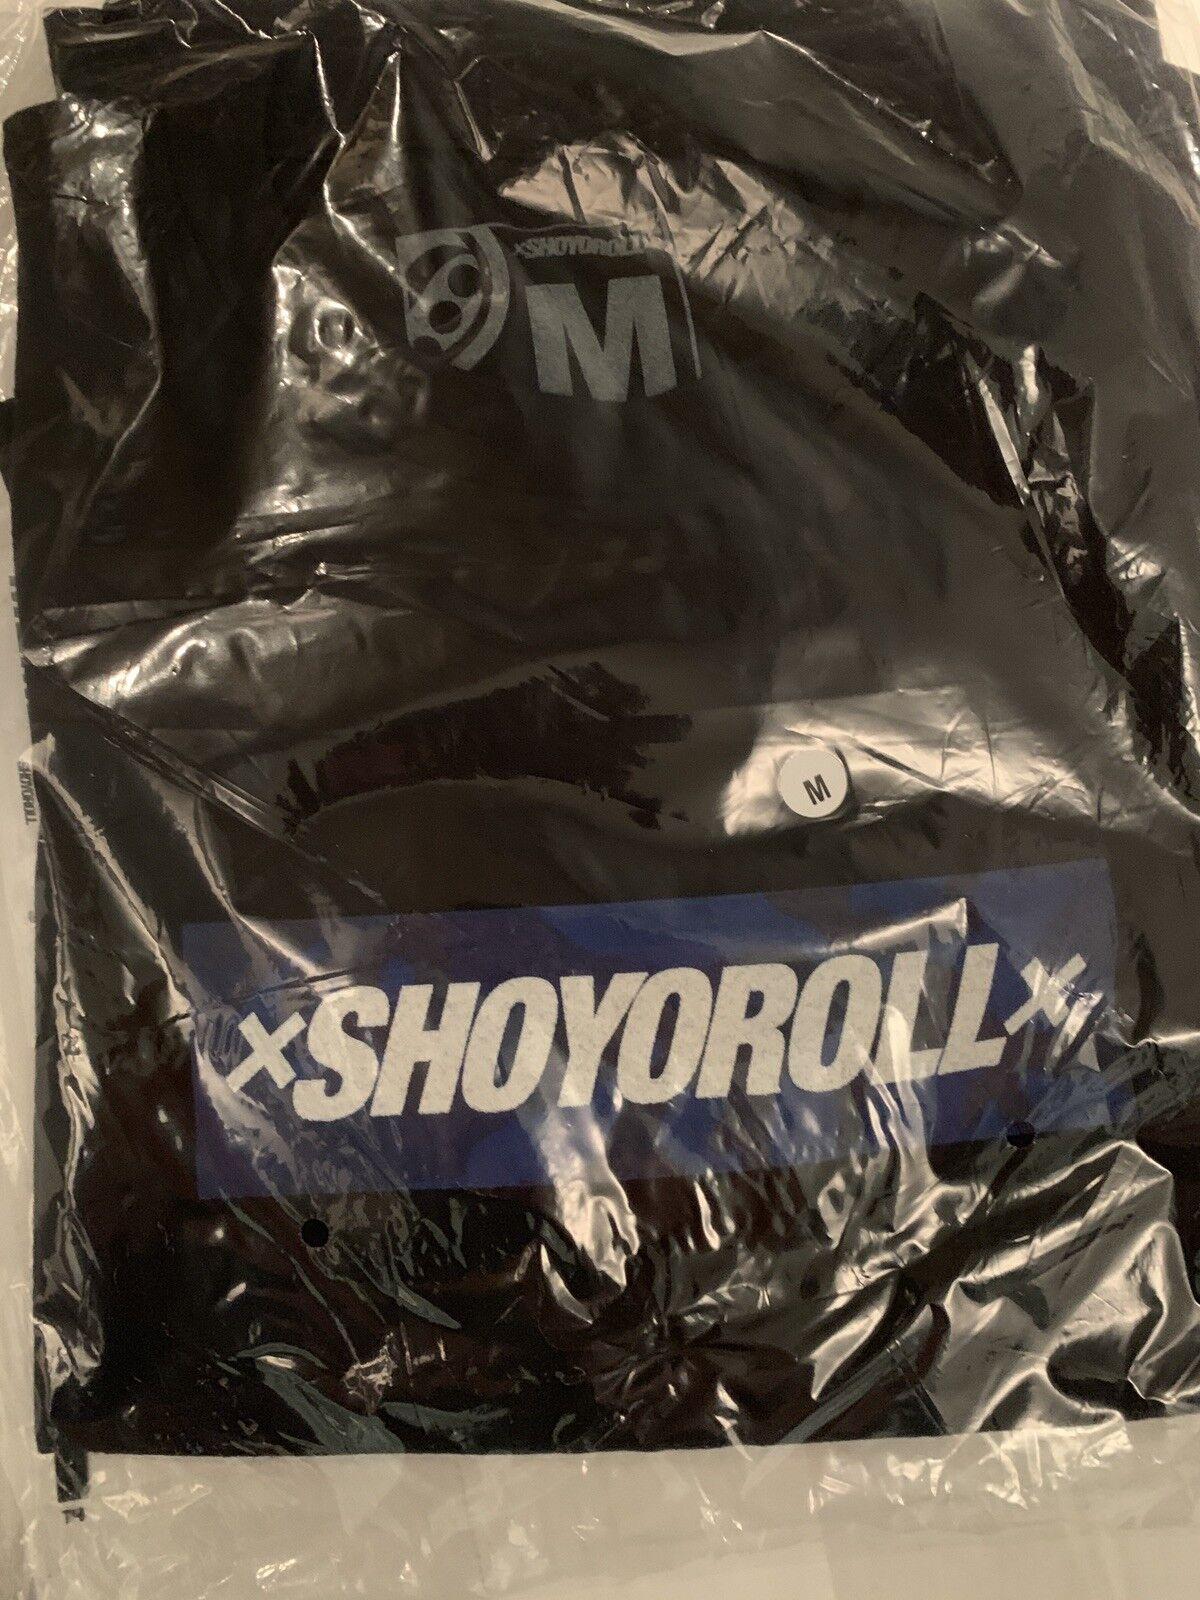 Shoygoldll 2017 GUMA Membership T shirt - Medium M